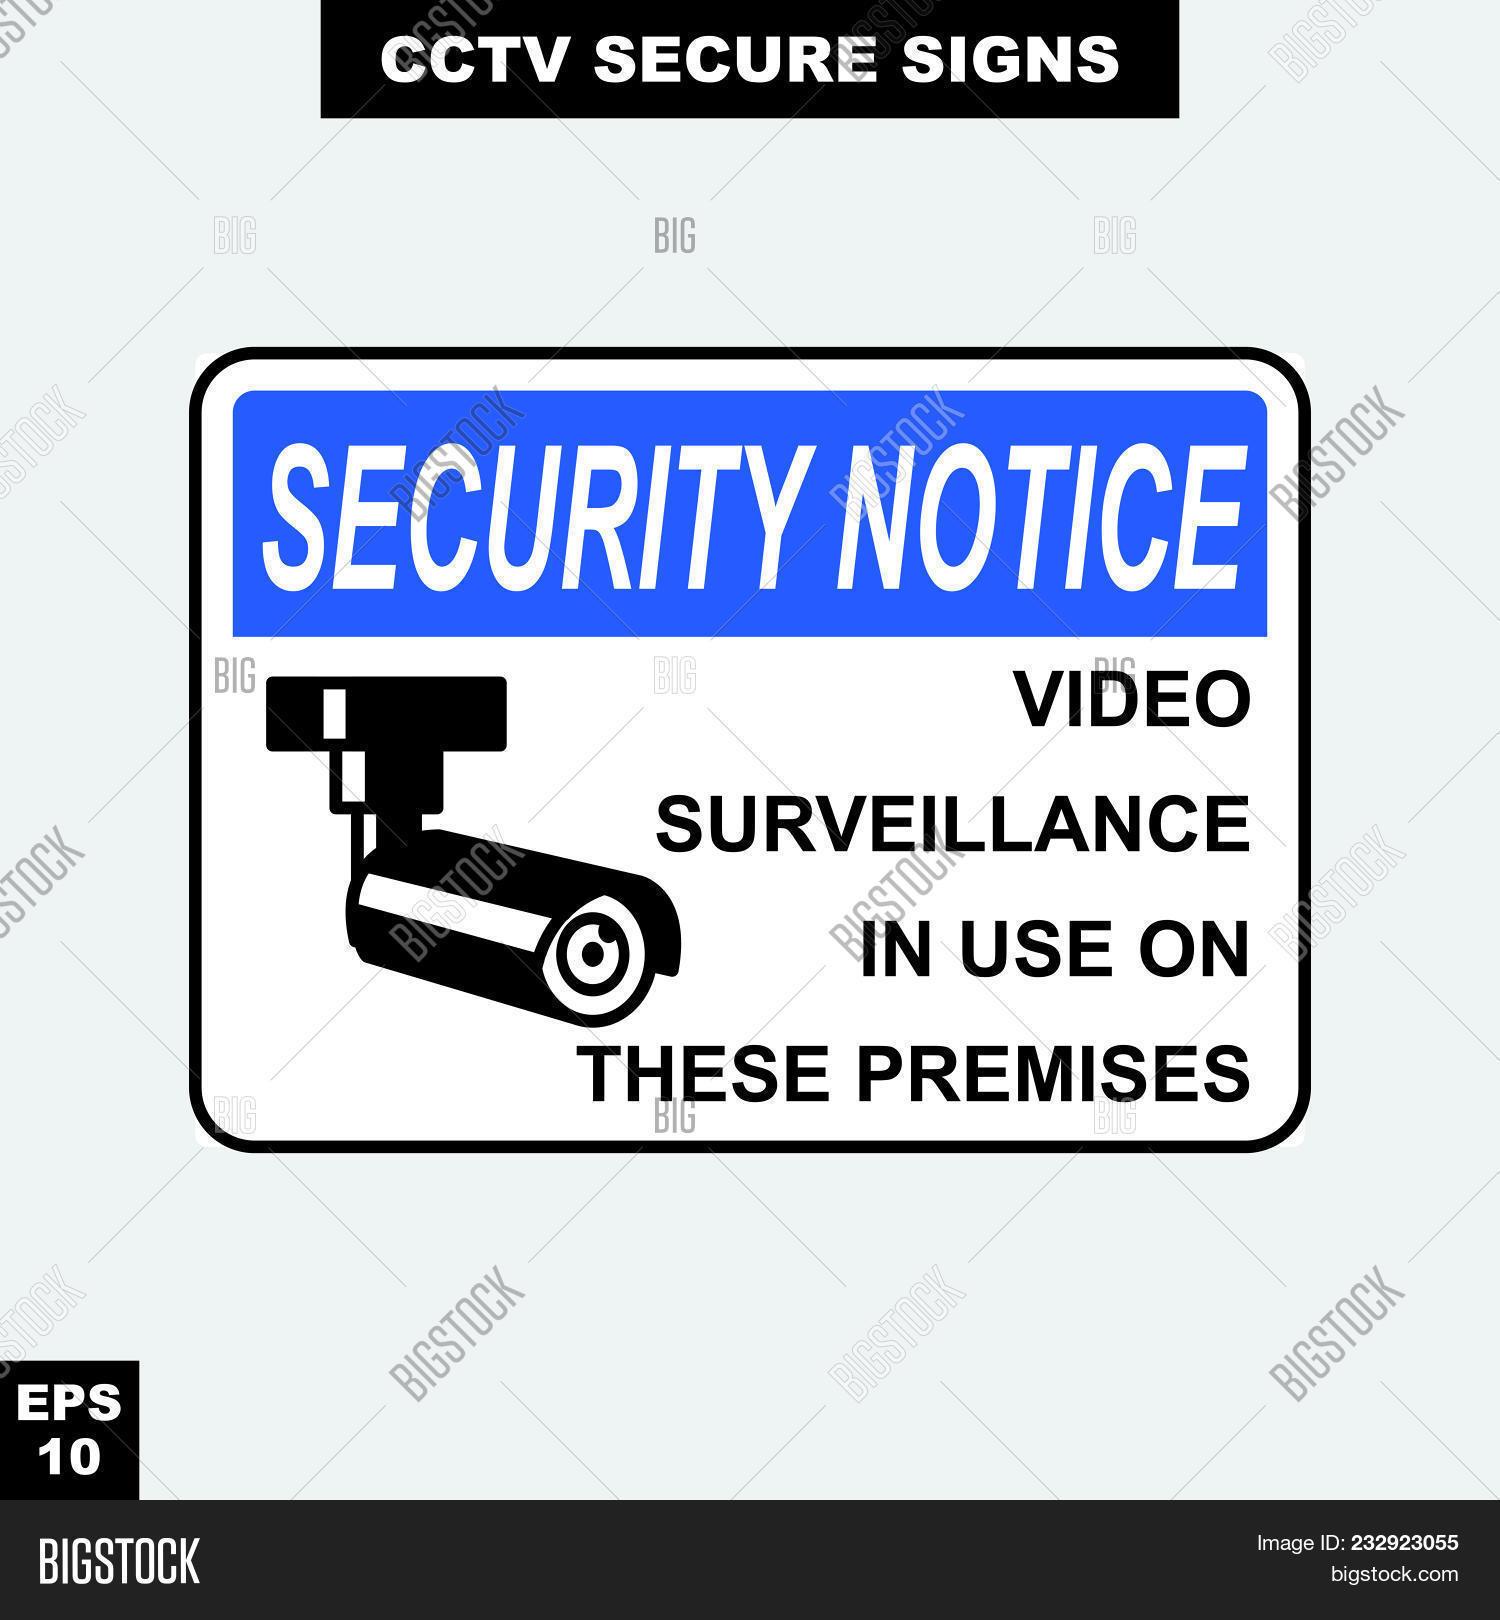 Print Vector & Photo (Free Trial) | Bigstock - Printable Video Surveillance Signs Free